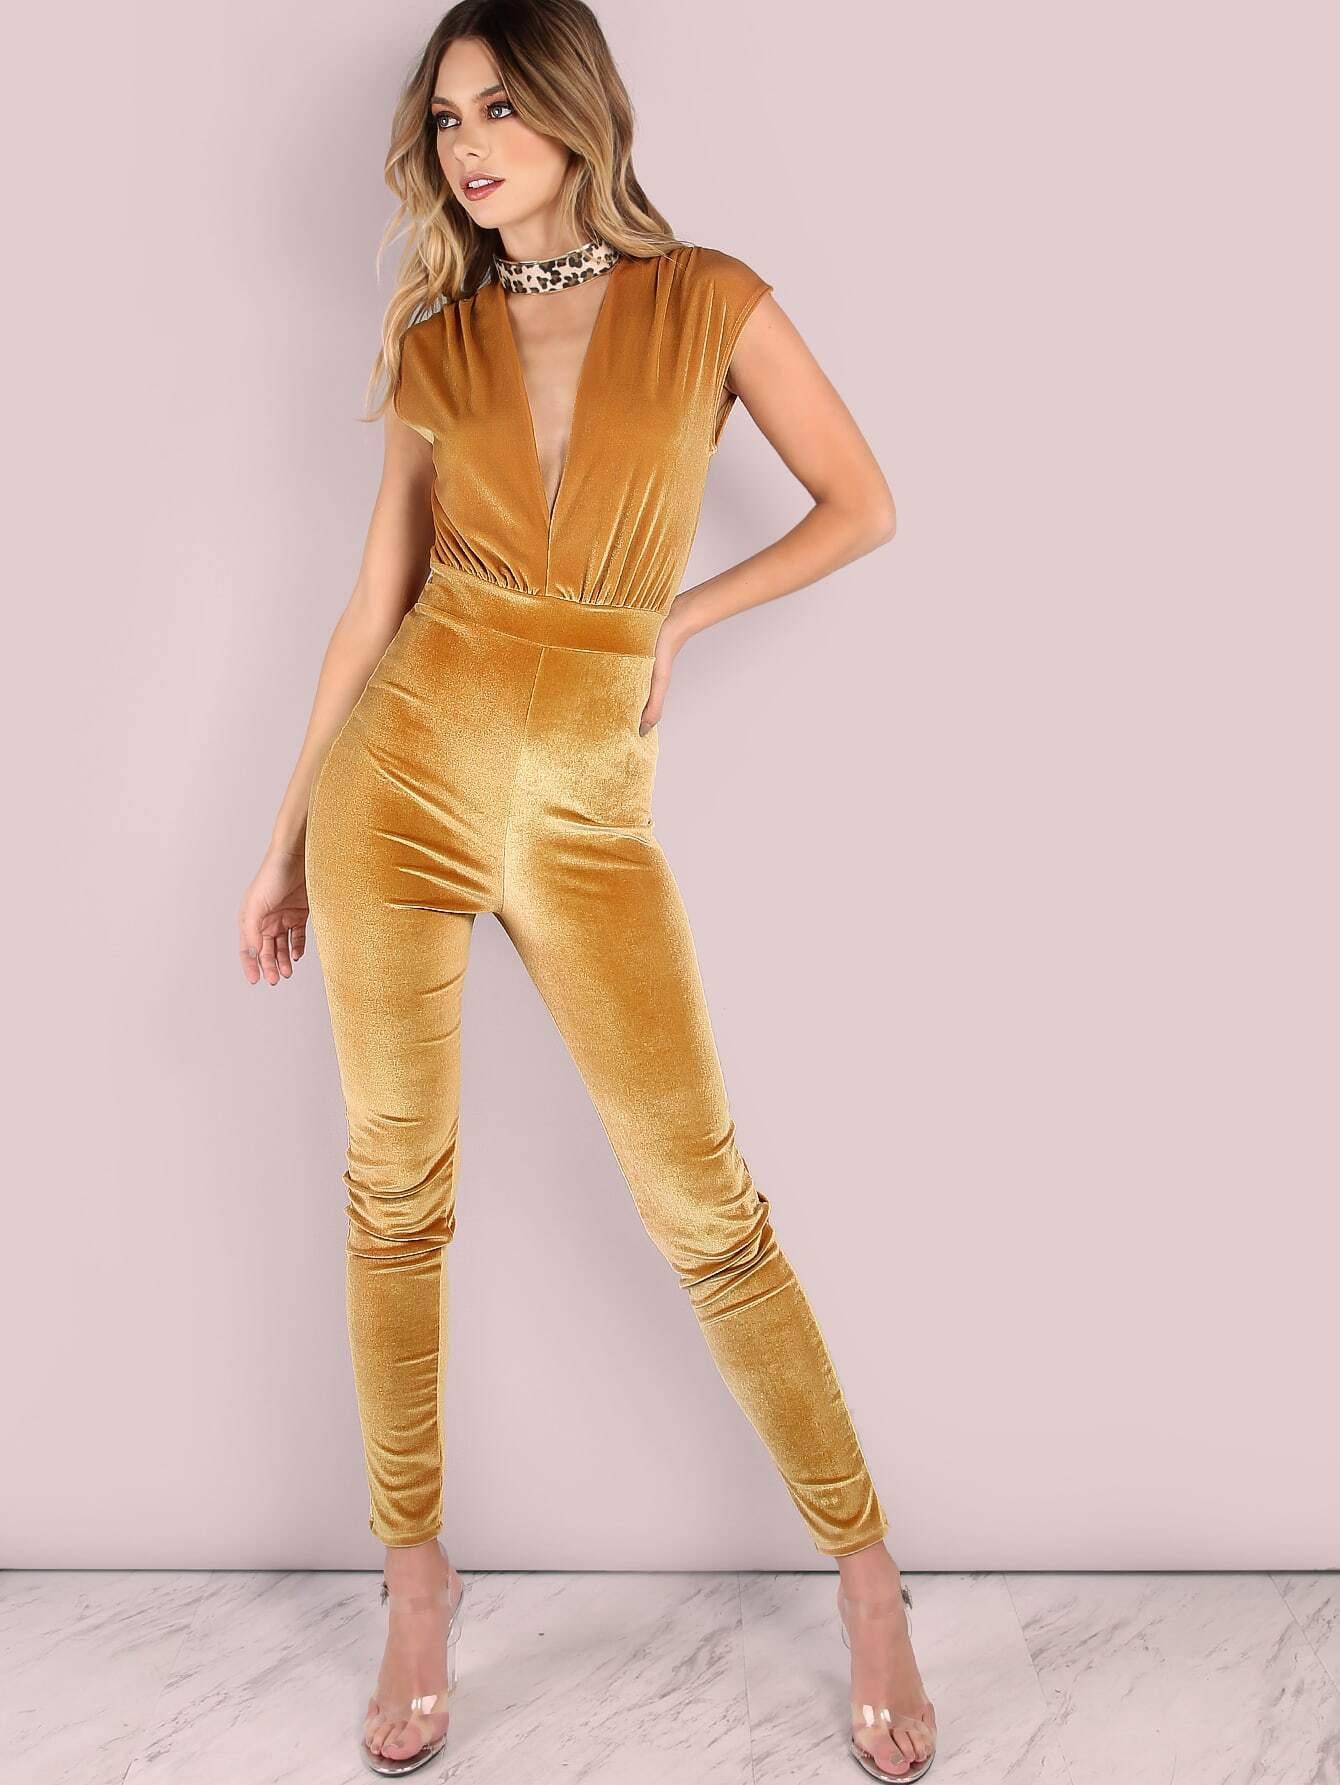 Velvet Plunge Jumpsuit Gold Emmacloth Women Fast Fashion Online Mobile Site